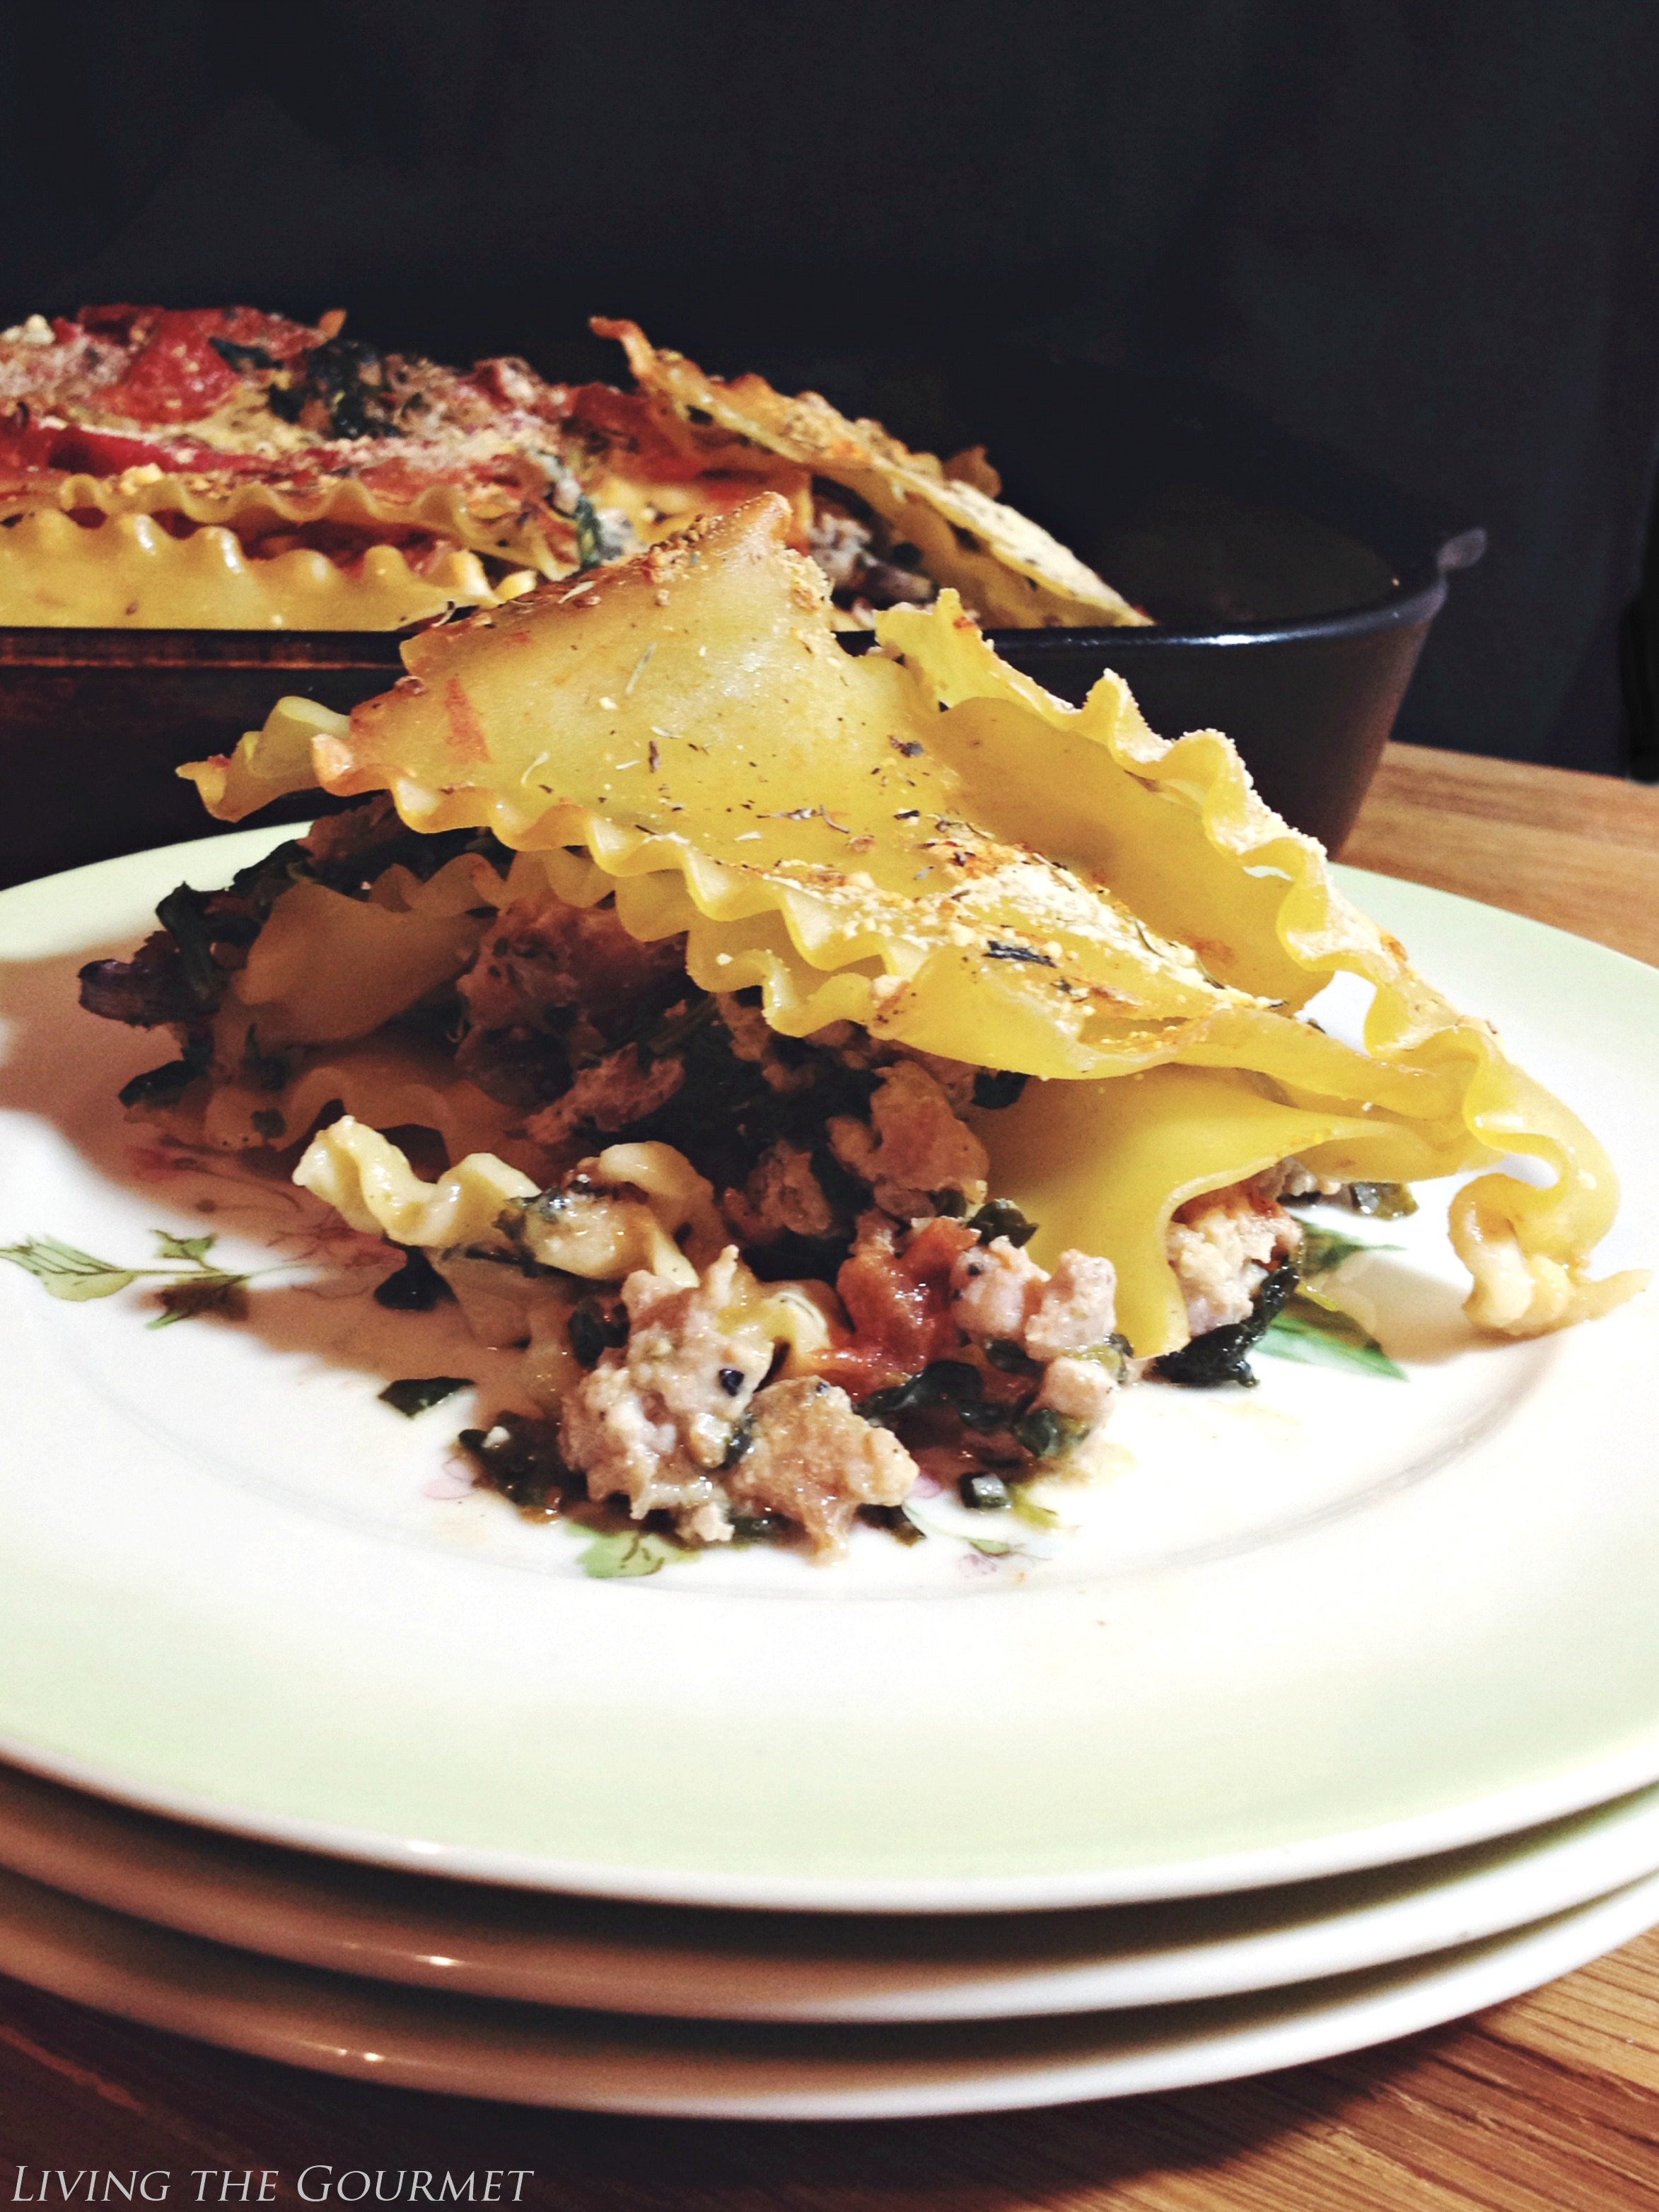 Living the Gourmet: Simple Lasagna